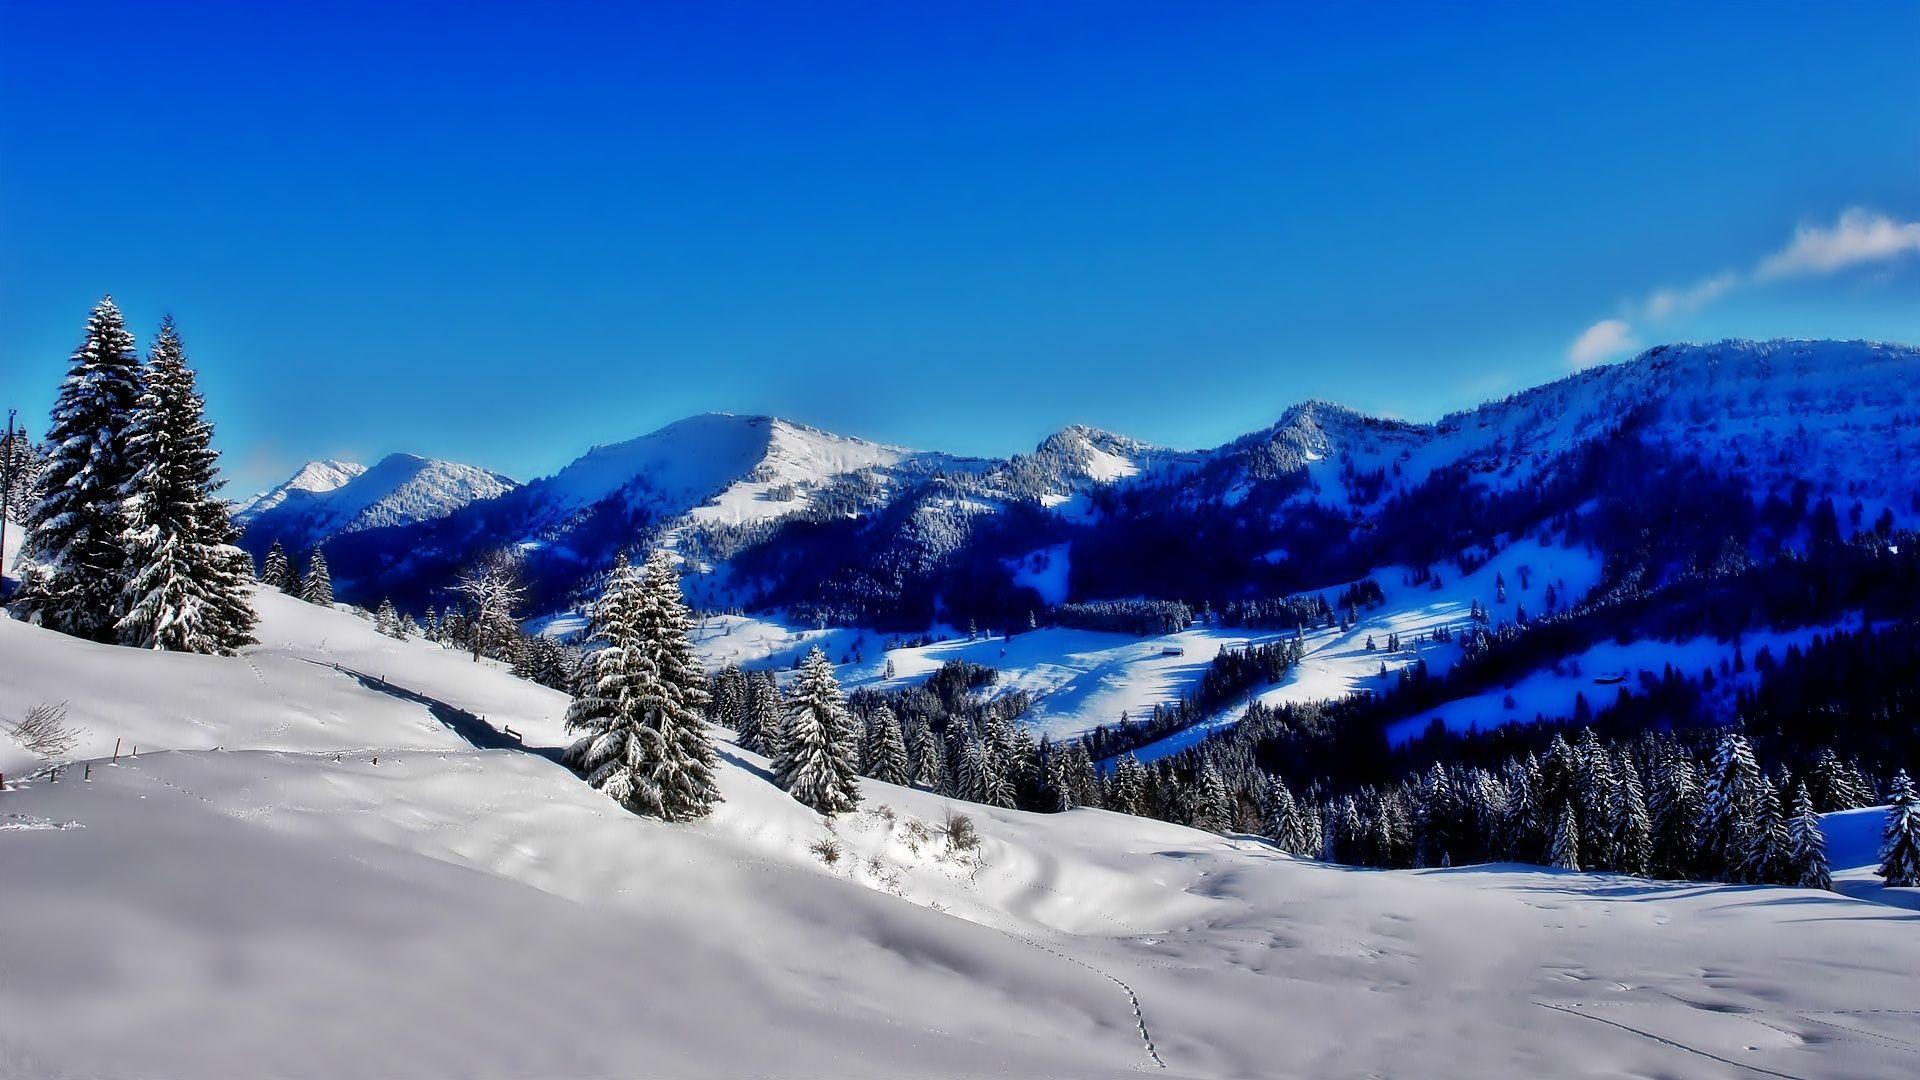 Cool Wallpaper Mountain Christmas - 0d9959b00a8df8b09d0244efe757944a  2018_257659.jpg